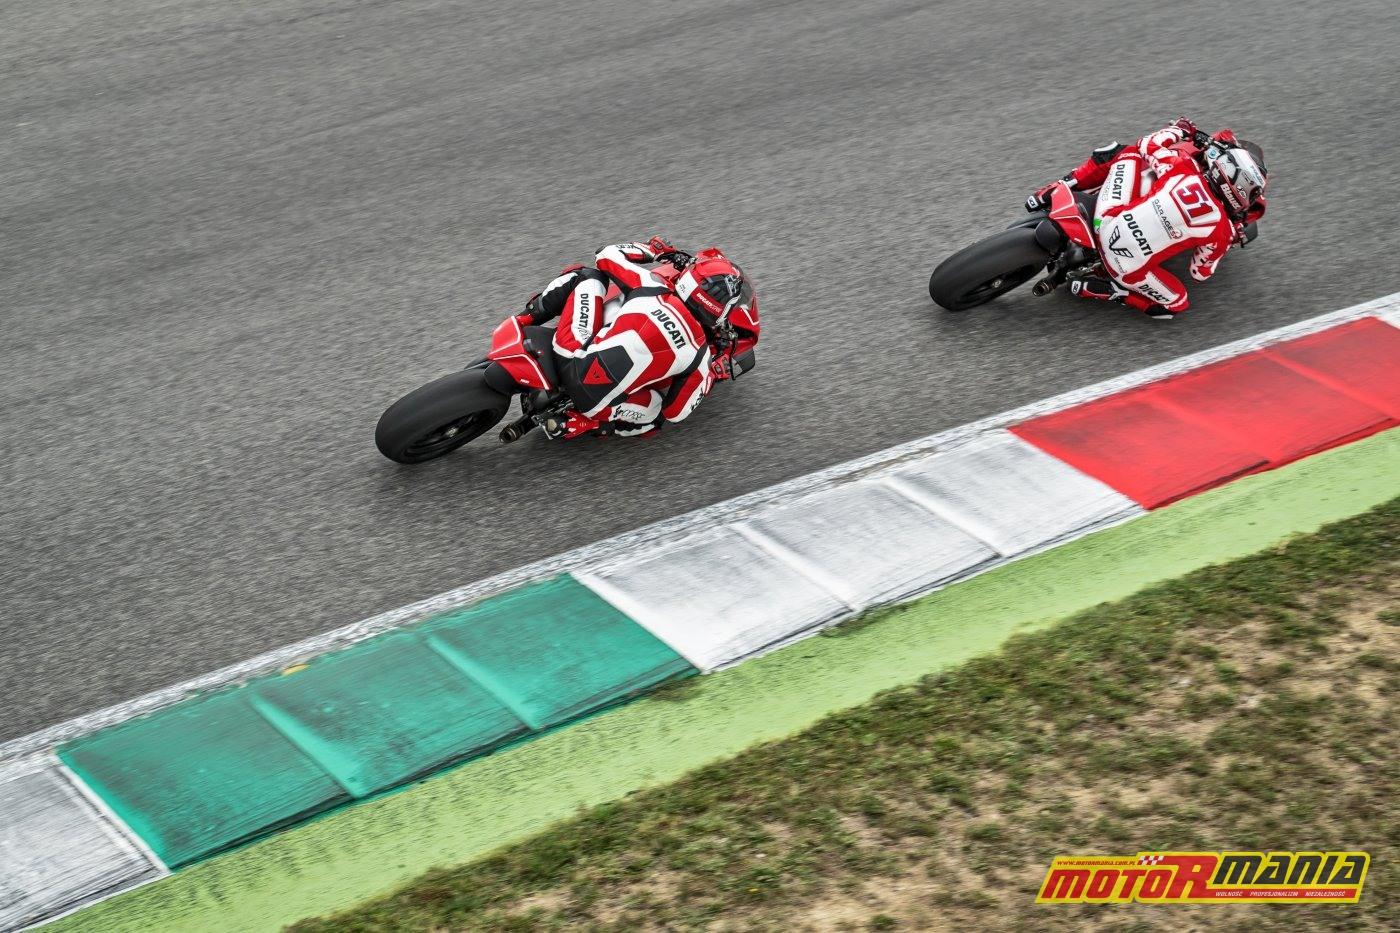 Ducati Panigale V4 R 2019 (8)